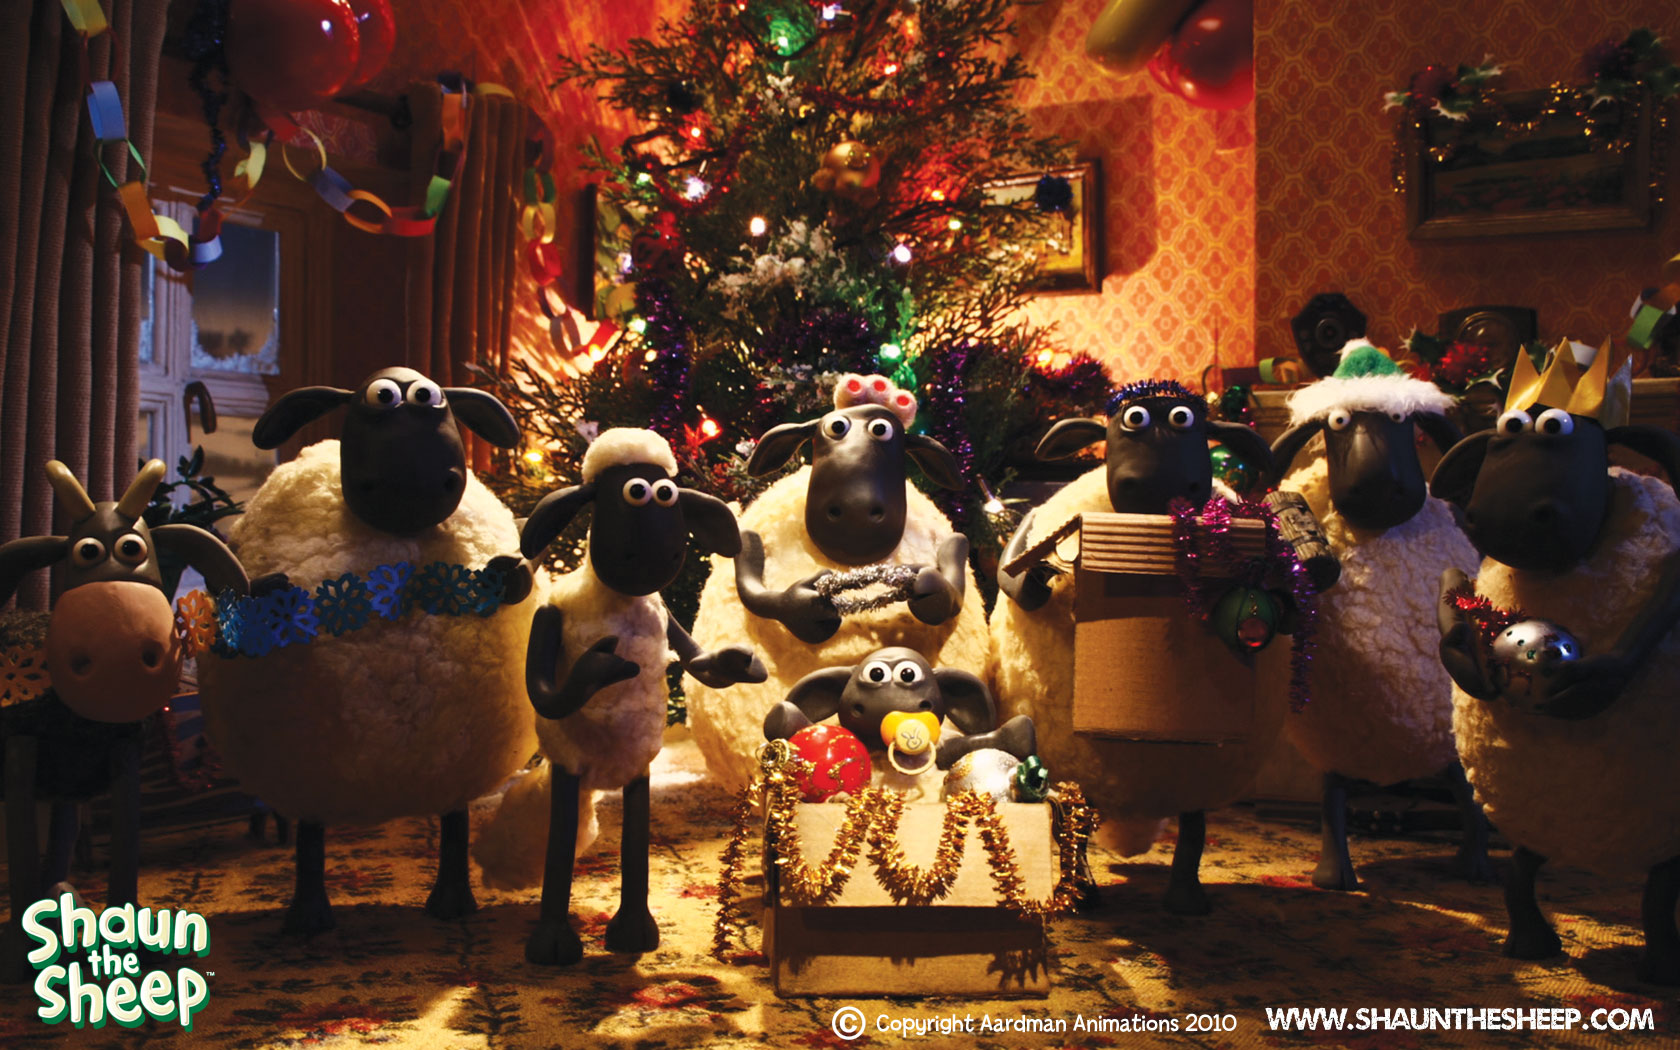 Image - Ewe A Merry X-mas wallpaper XL.jpg | Shaun the Sheep Wiki ...